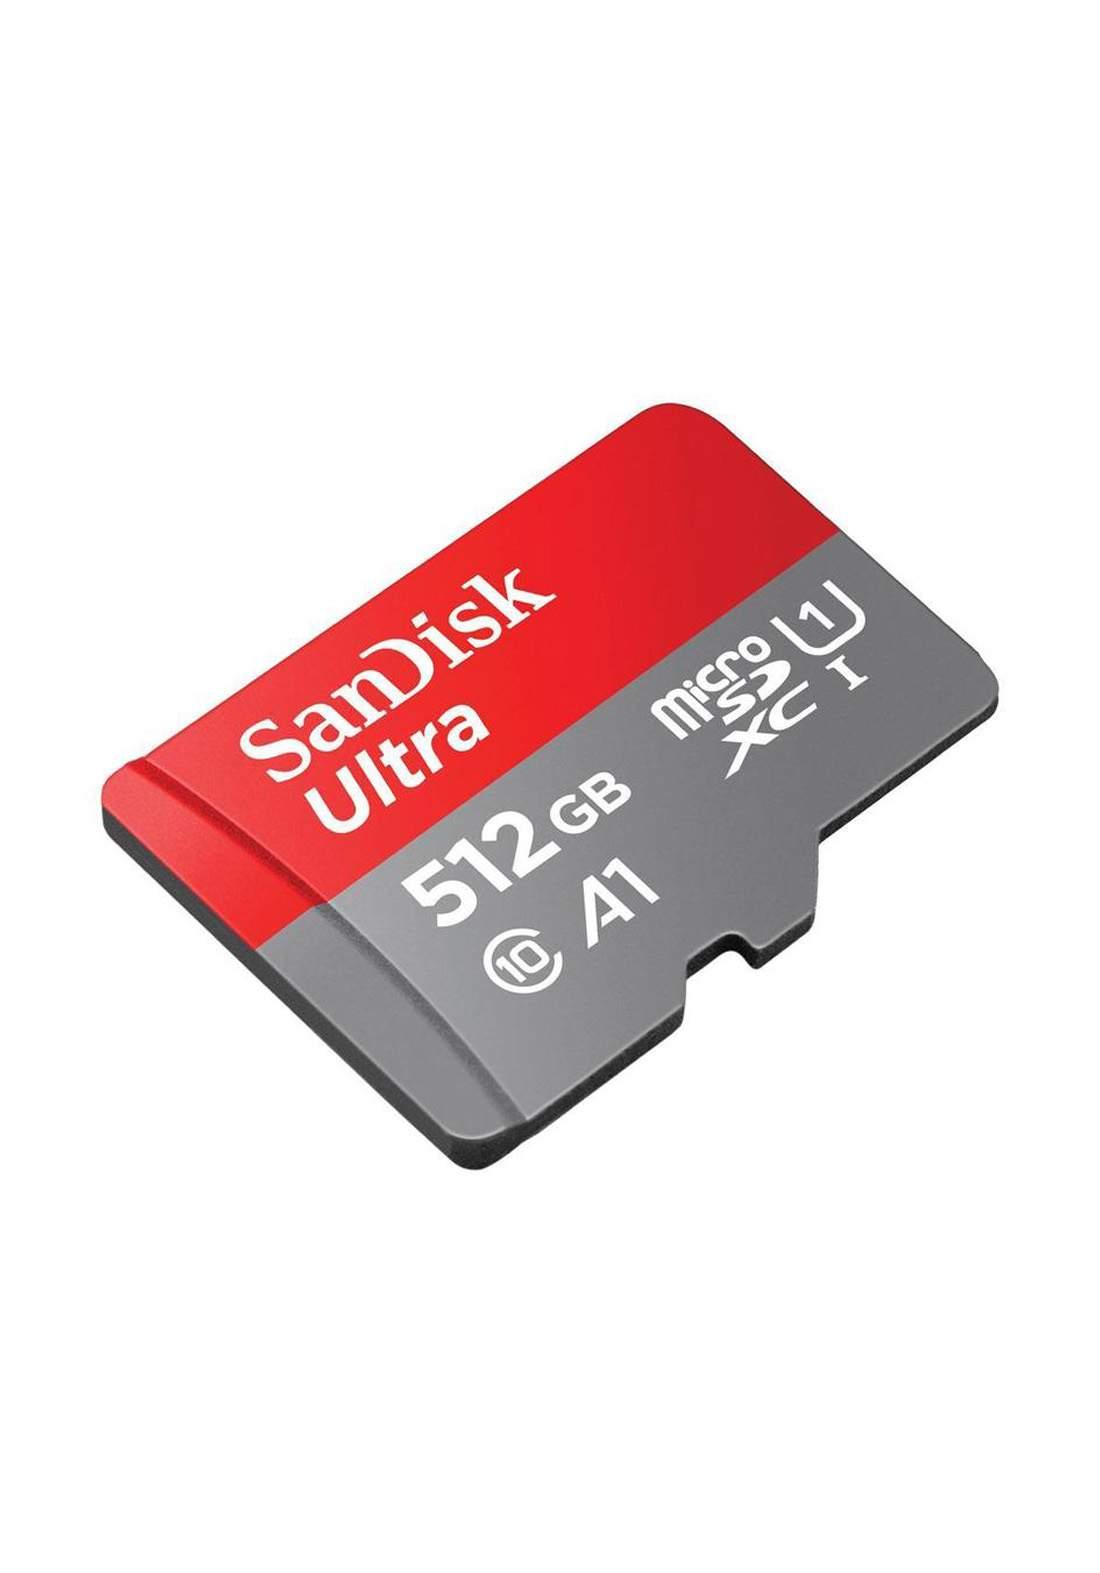 Sandisk Ultra MicroSDXC UHS-I Card 512 GB - بطاقة ذاكرة